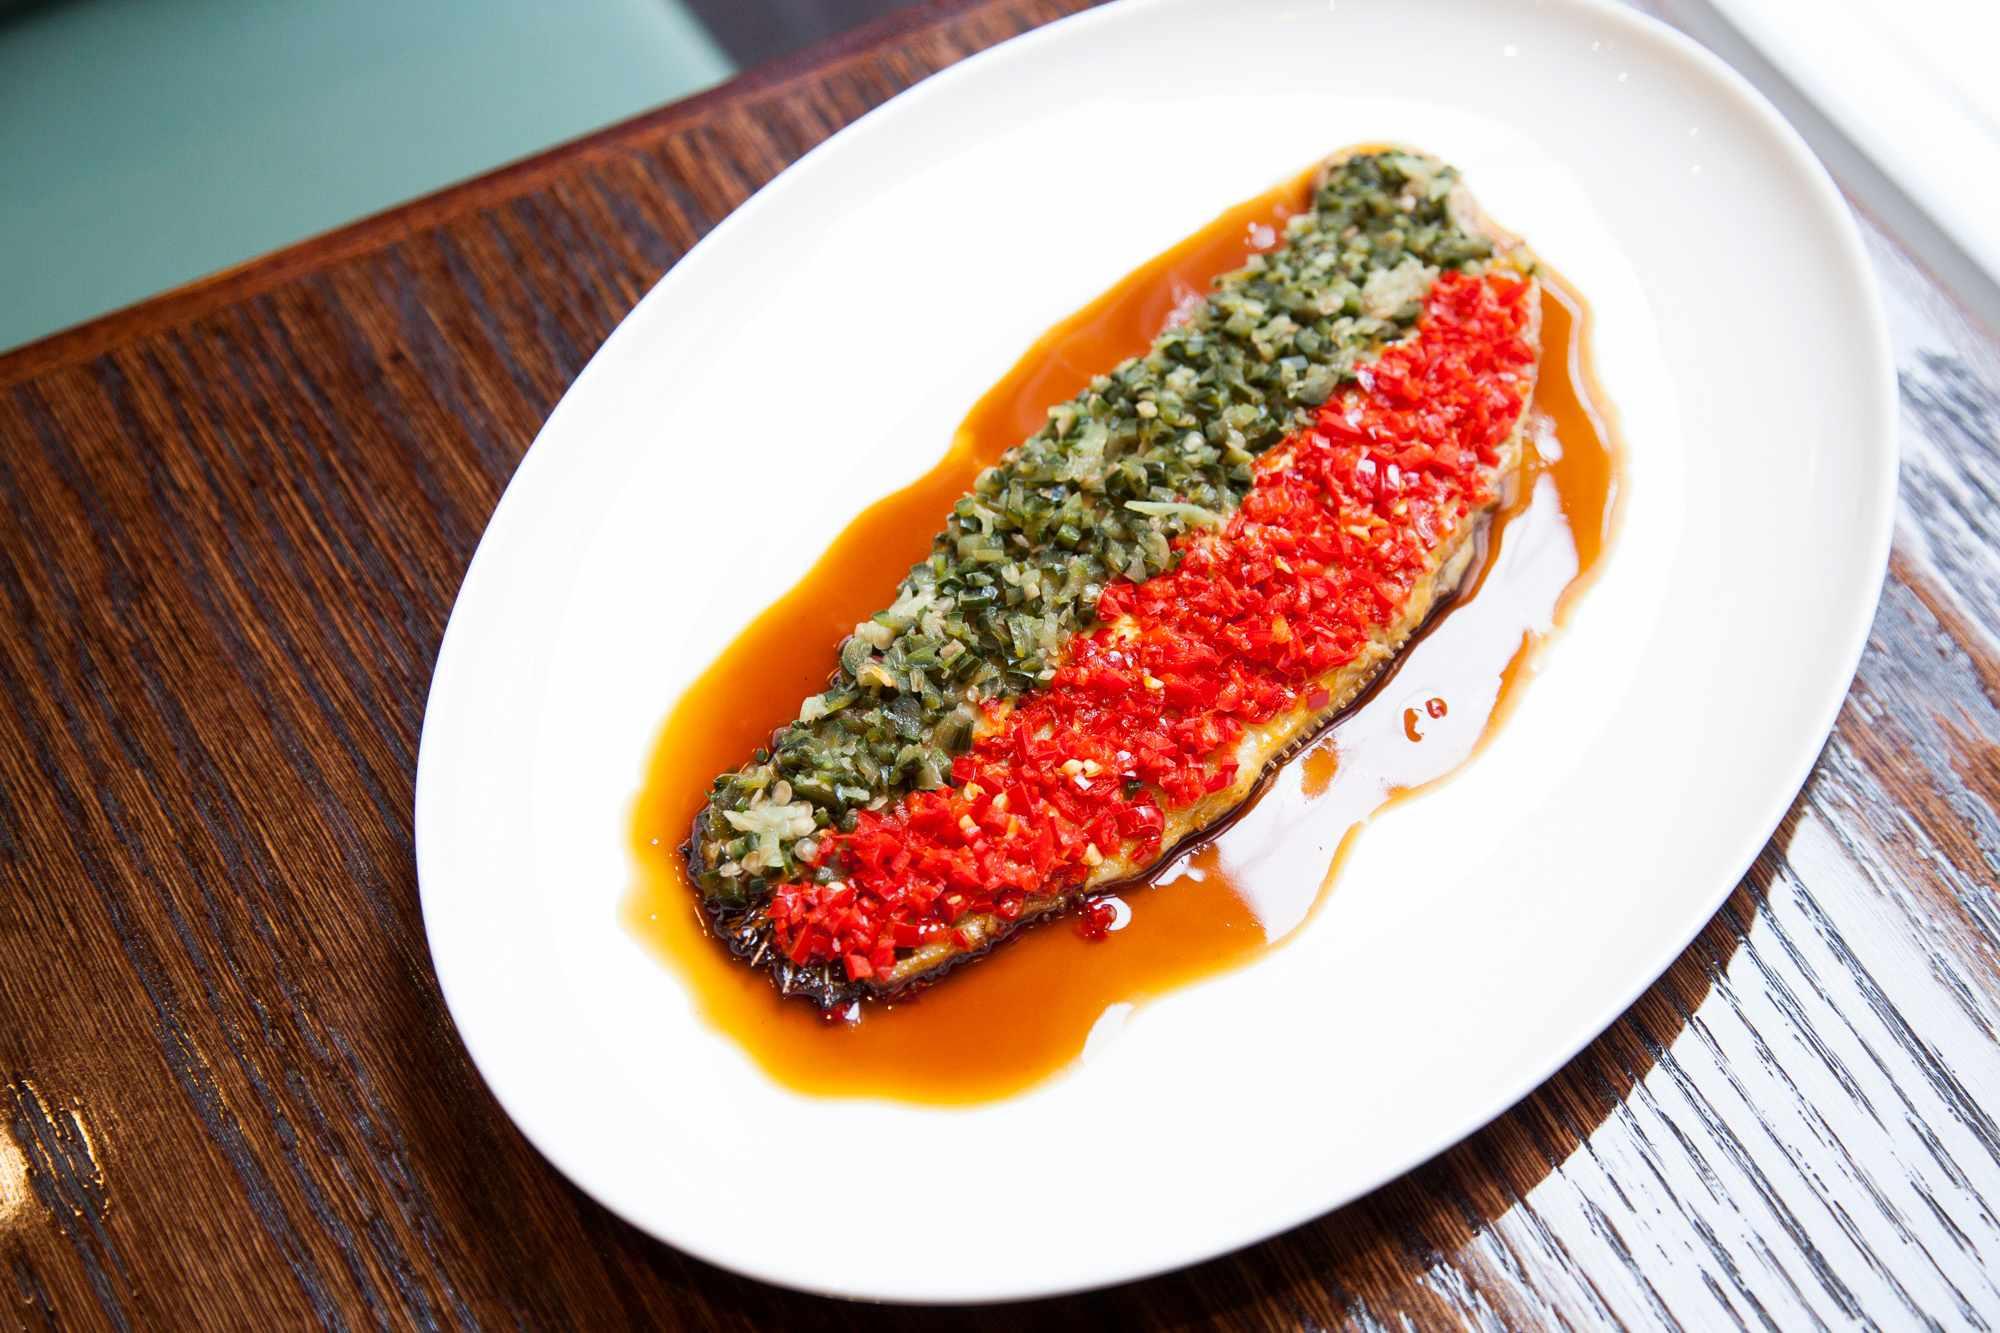 Sea bass recipe with fermented chilli